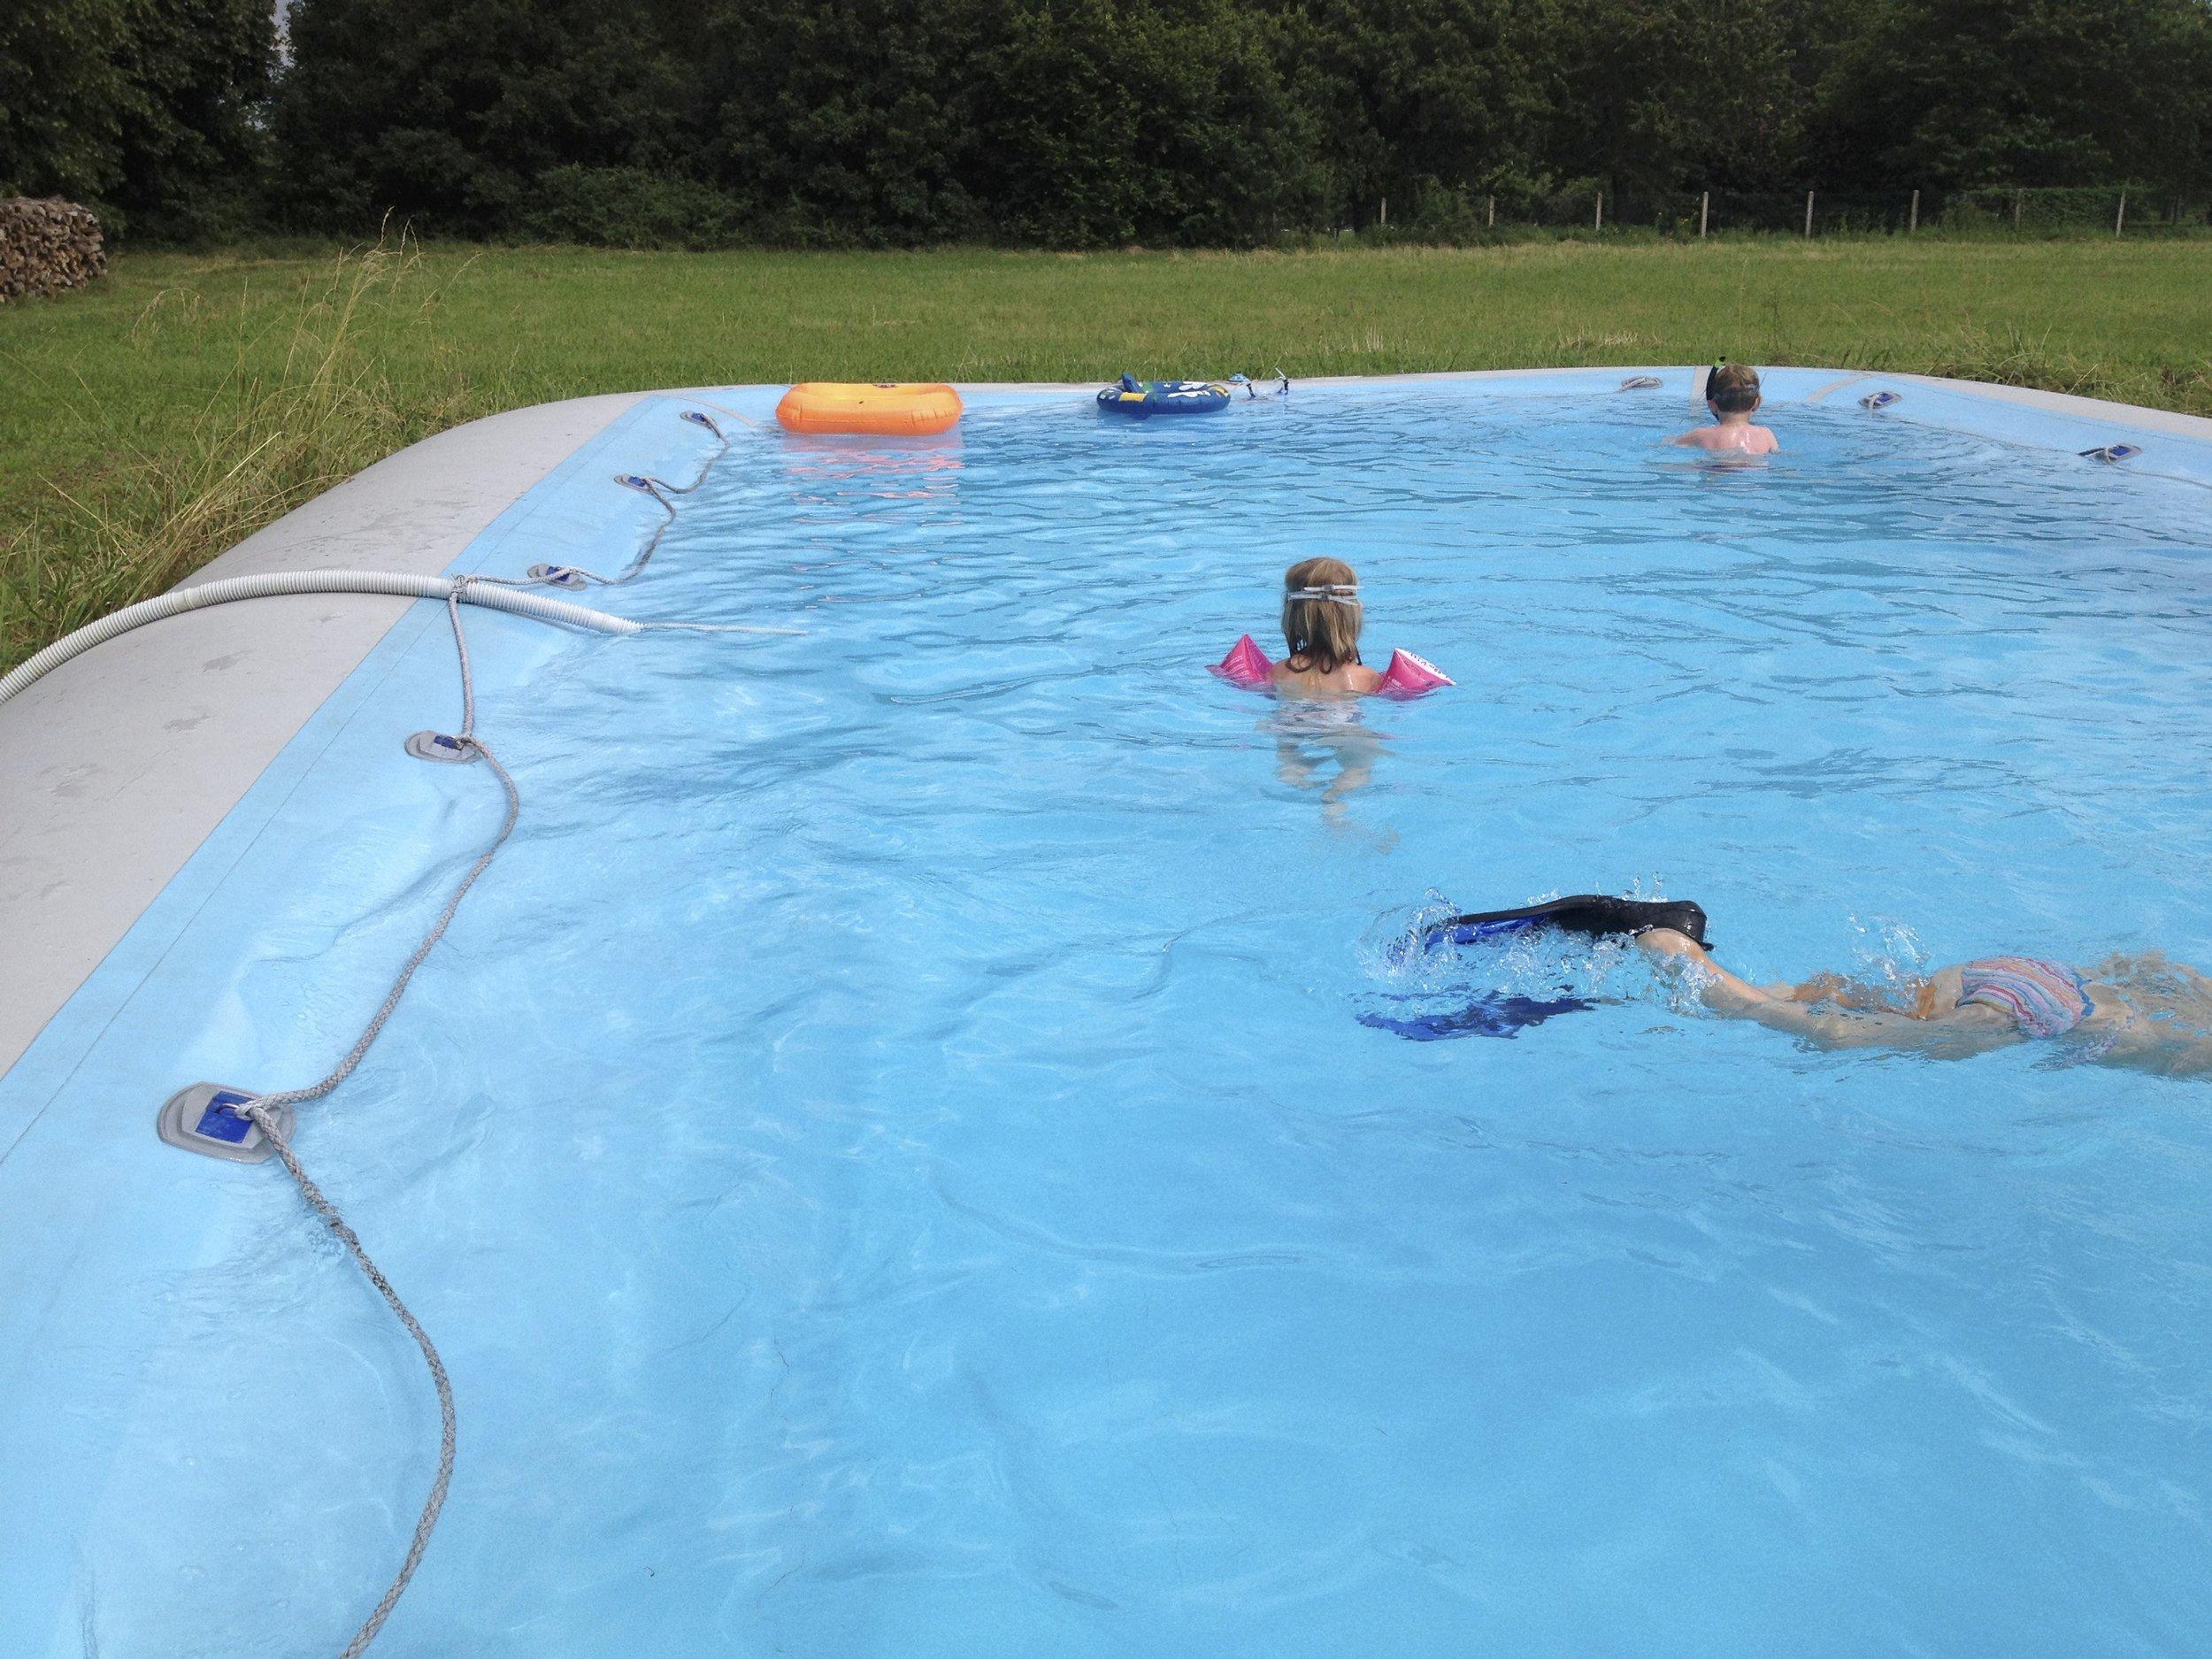 La Piscinethe Pool - het Zwembad - ° Adapté aux enfants, mais assez grand pour les grands° Child friendly, but big enough to have a nice swim as an adult° Kindvriendelijk, maar groot genoeg om ook als volwassene in te kunnen zwemmen